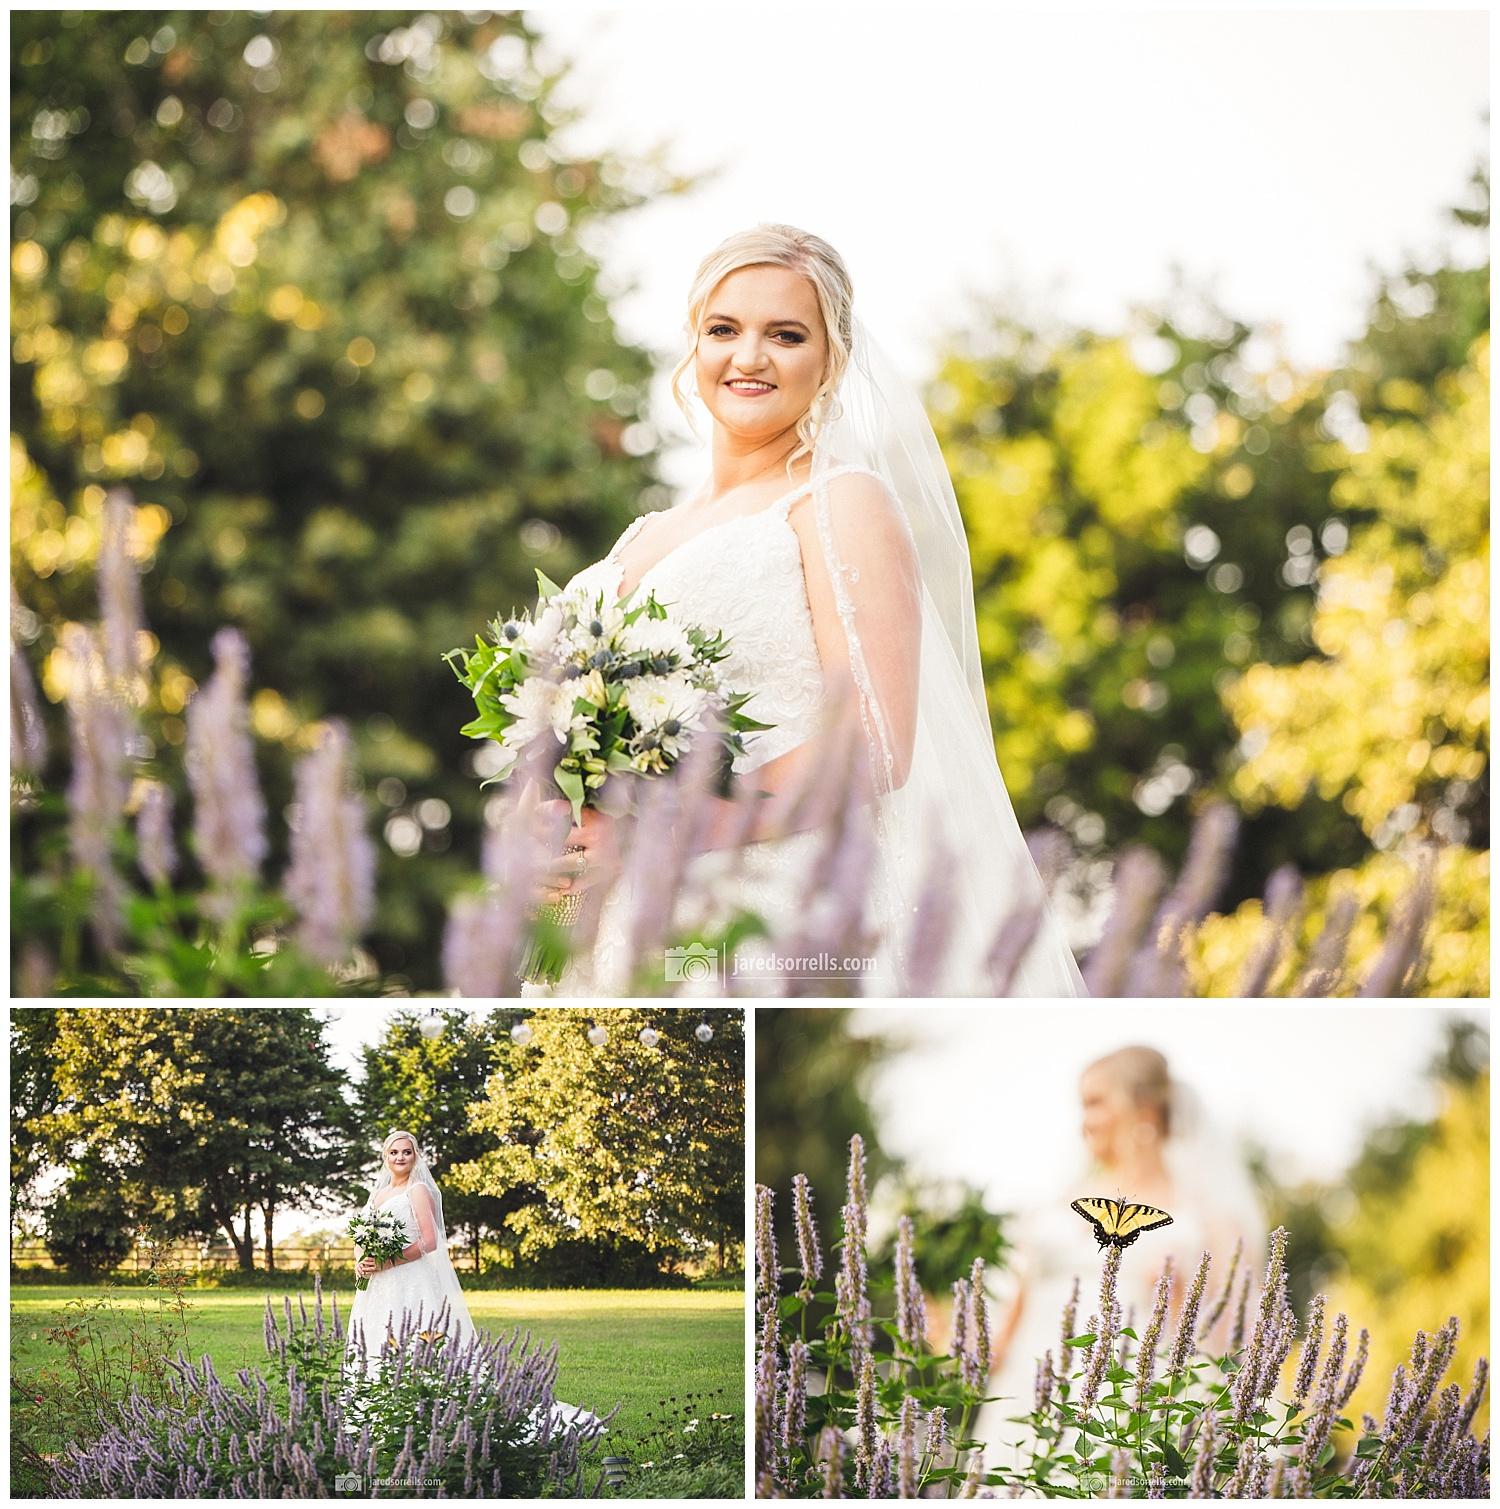 Haley - Bridals-4689.jpg